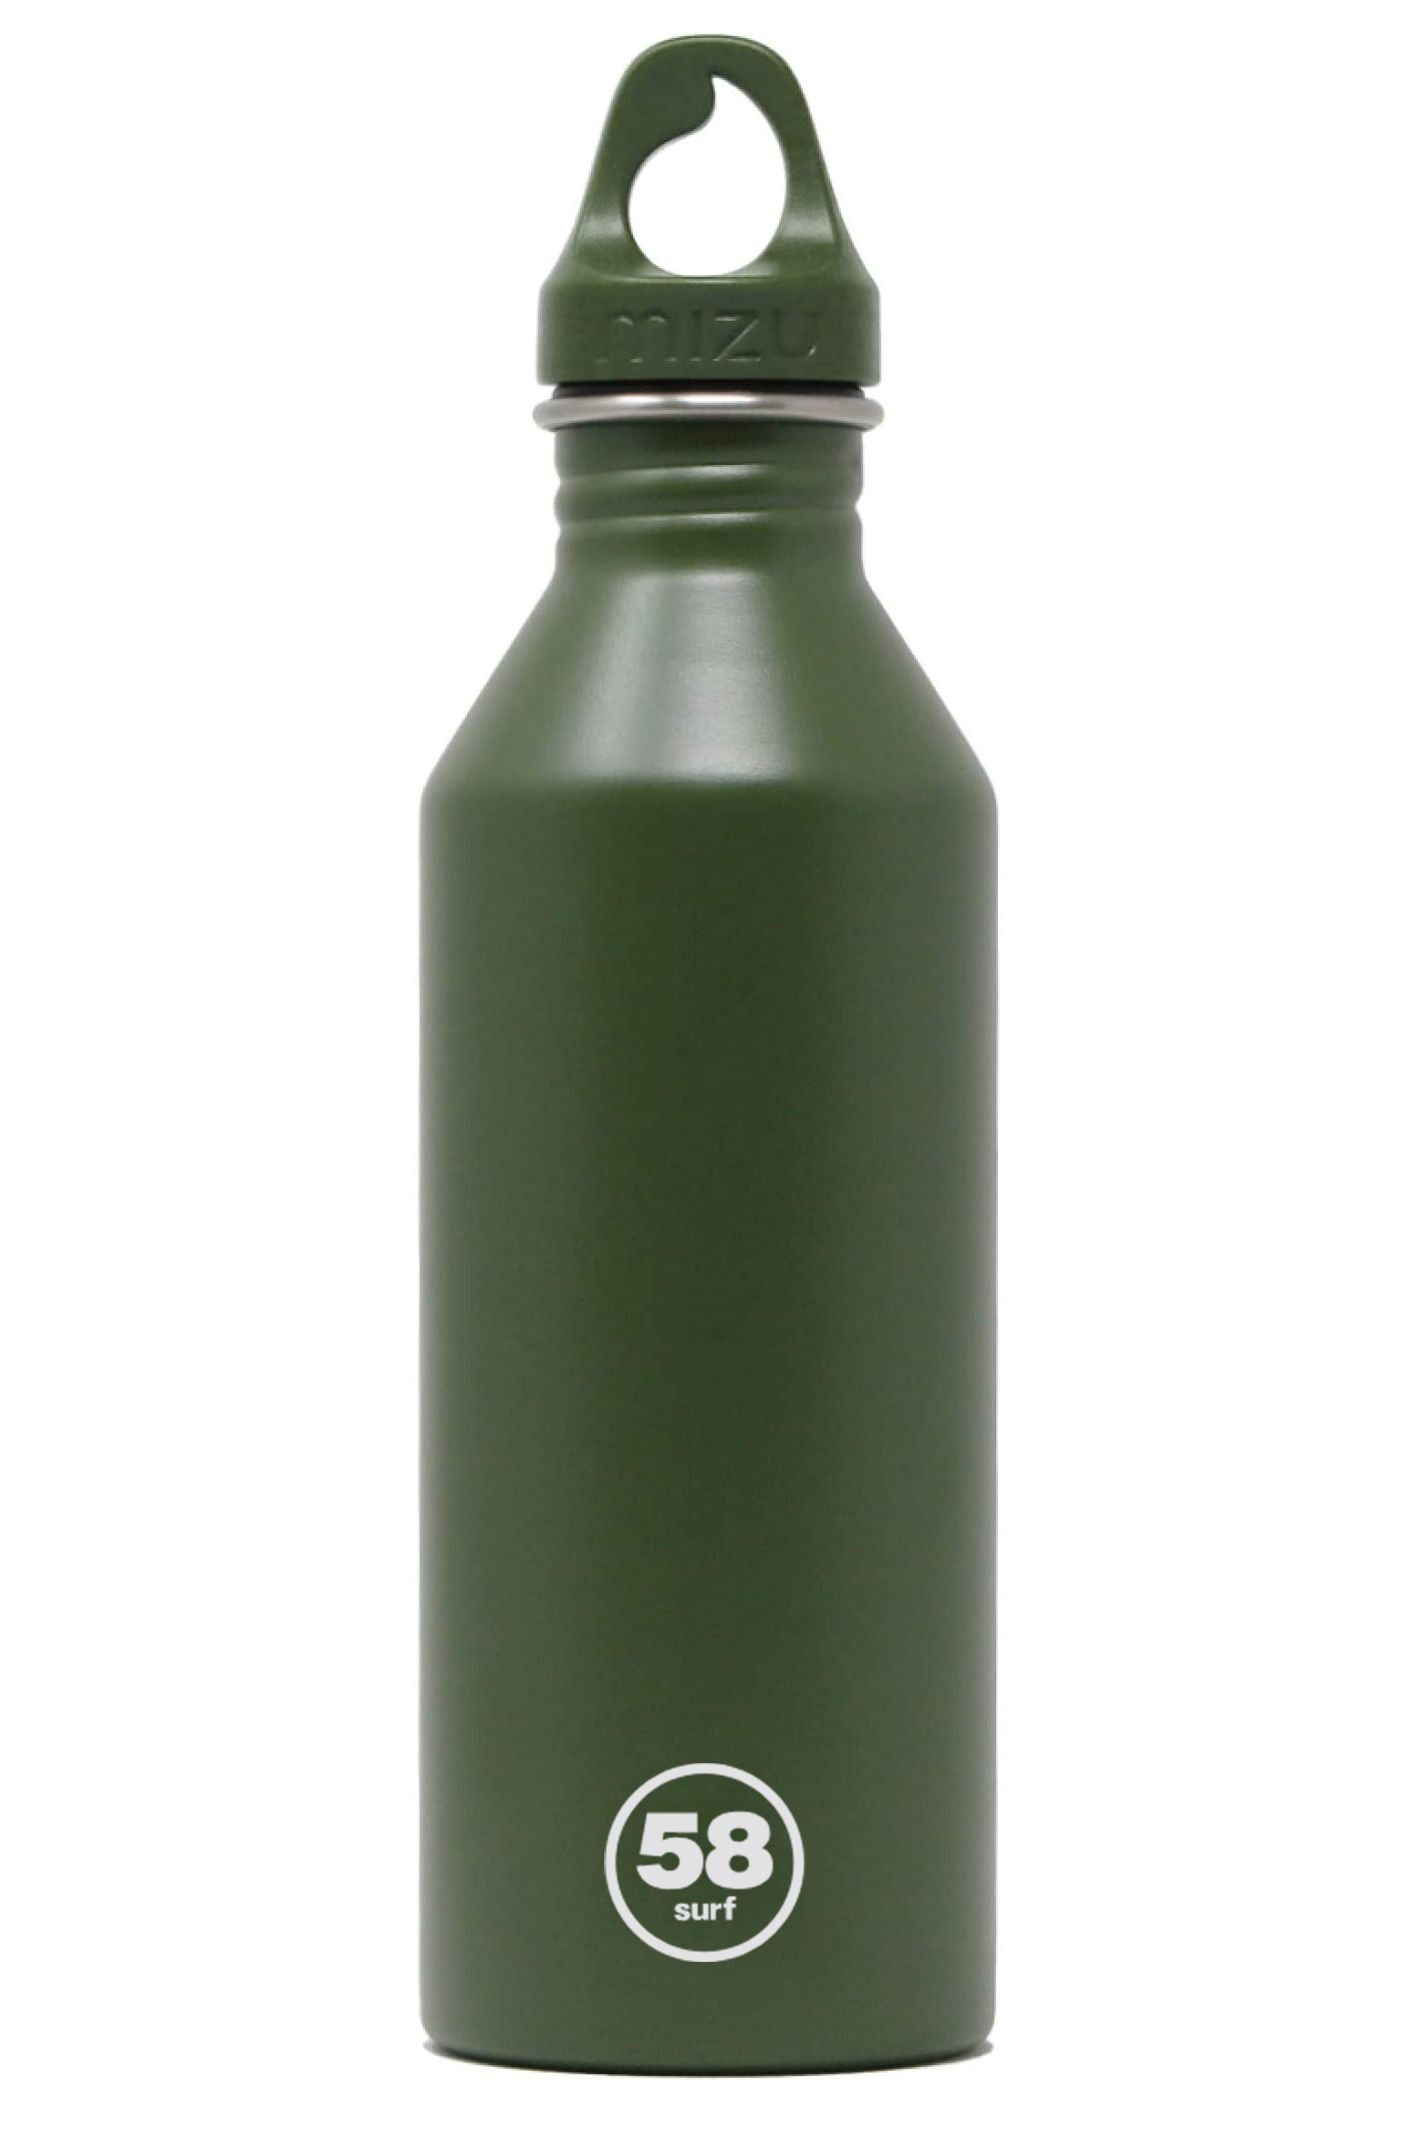 Mizu Bottle vs 58 Surf M8 Army Green